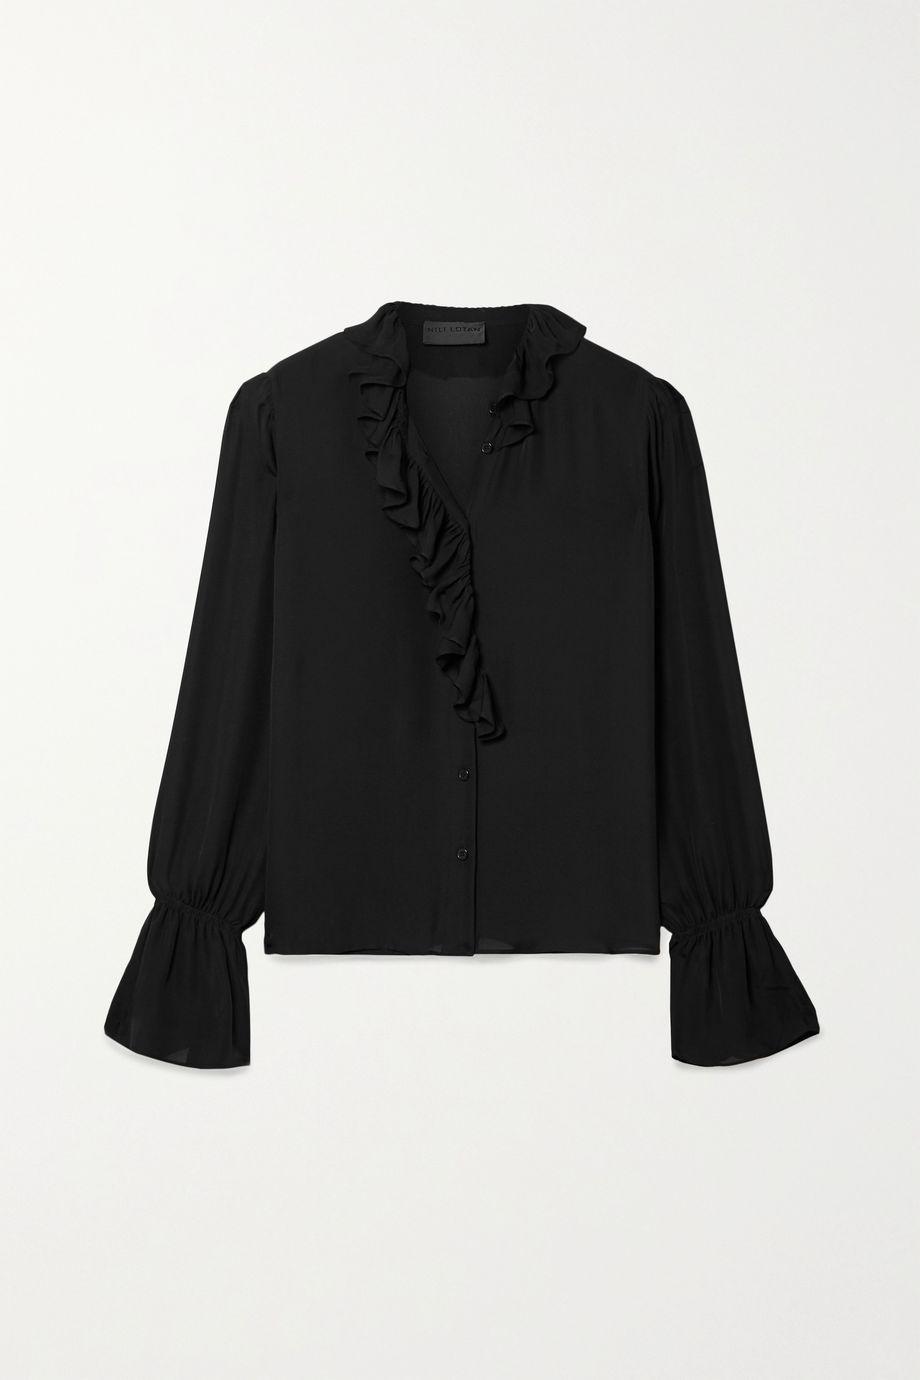 Nili Lotan Cecily ruffled silk-chiffon shirt